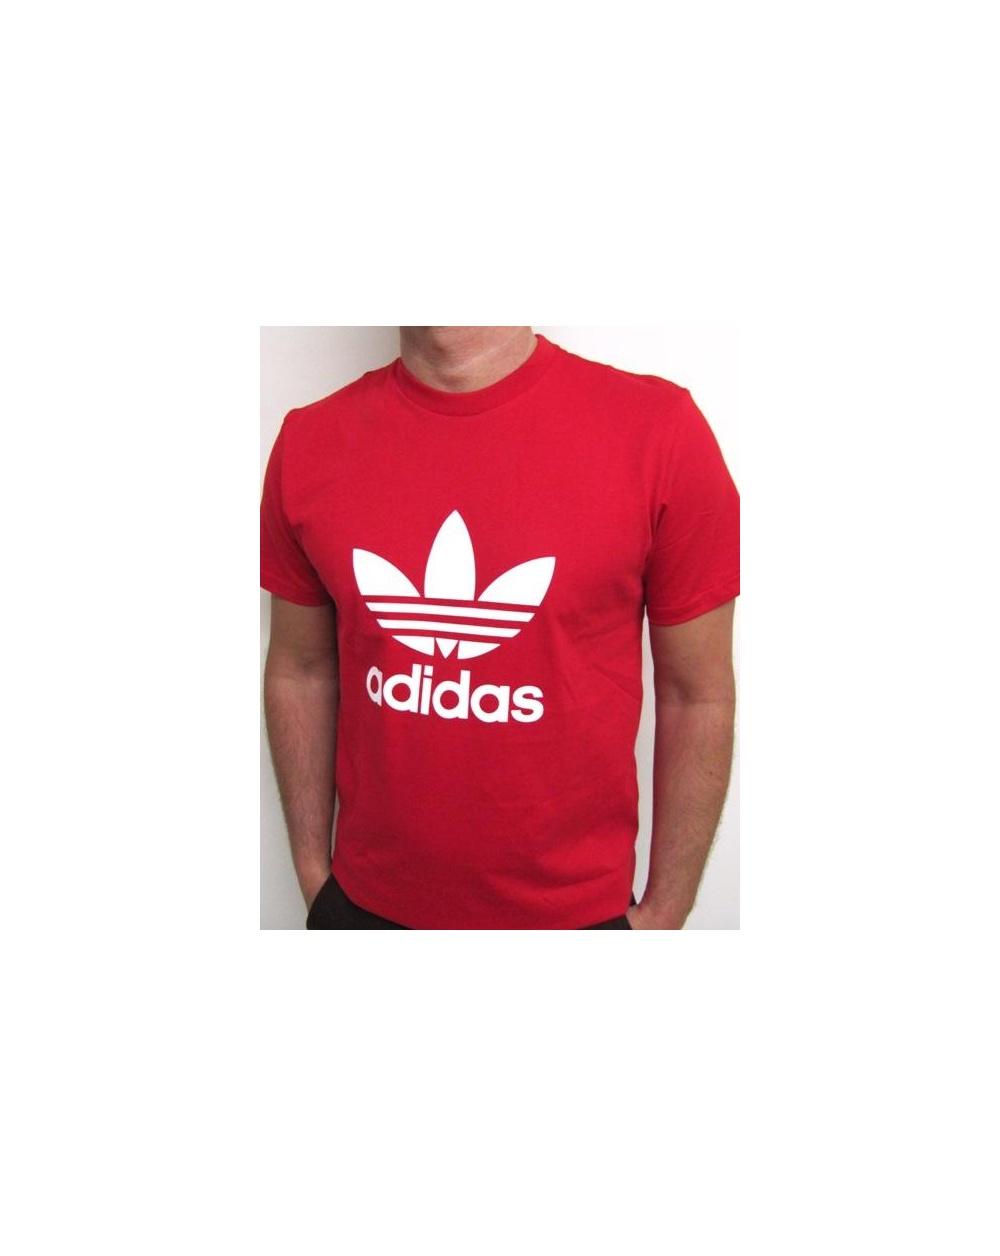 Adidas originals trefoil t shirt with large logo red 0 for Adidas trefoil t shirt